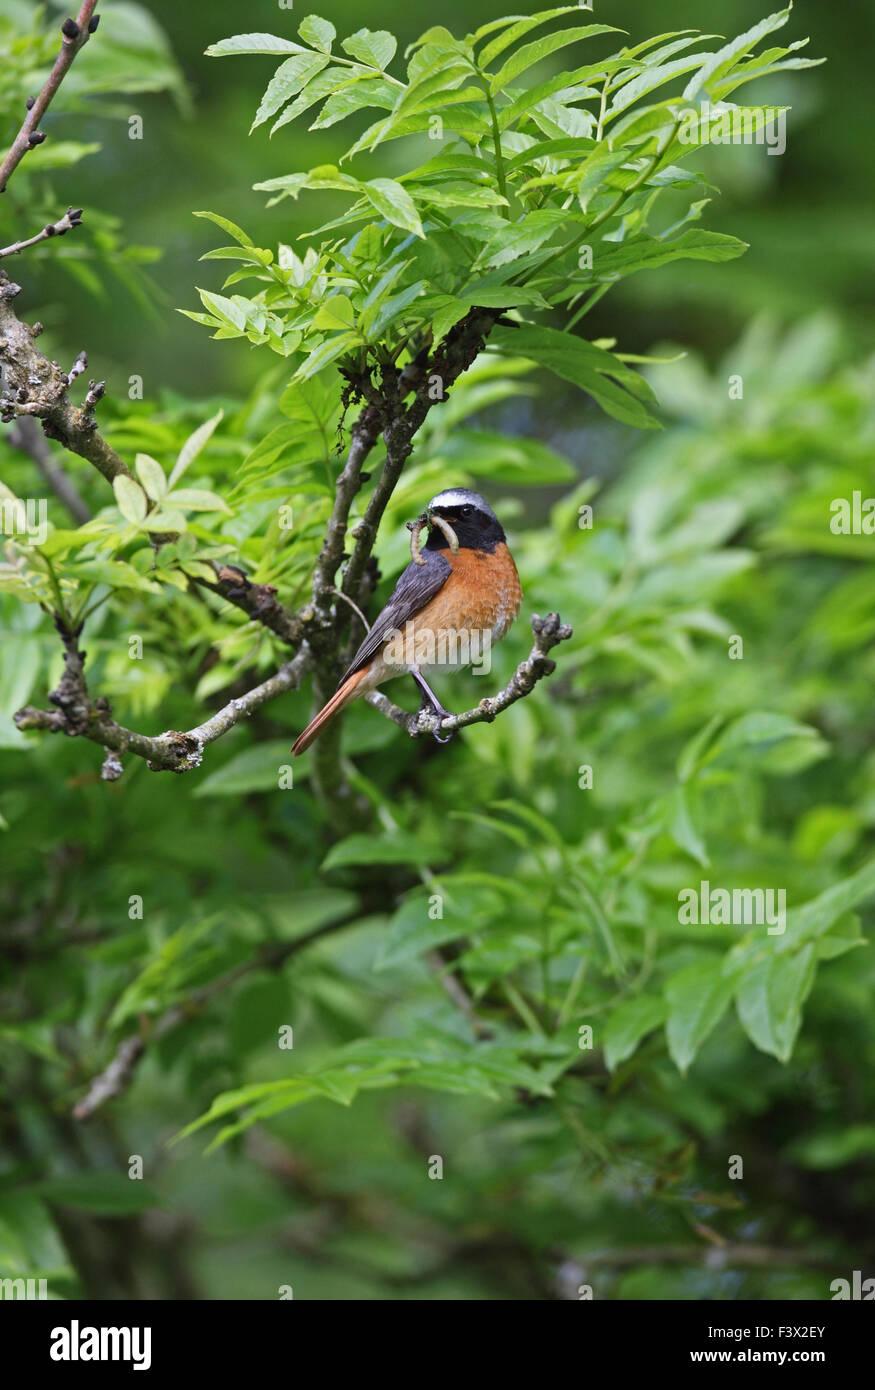 Homme percher sur ash tree branch avec beakfull caterpillers de Carmarthenshire juin 2015 Photo Stock